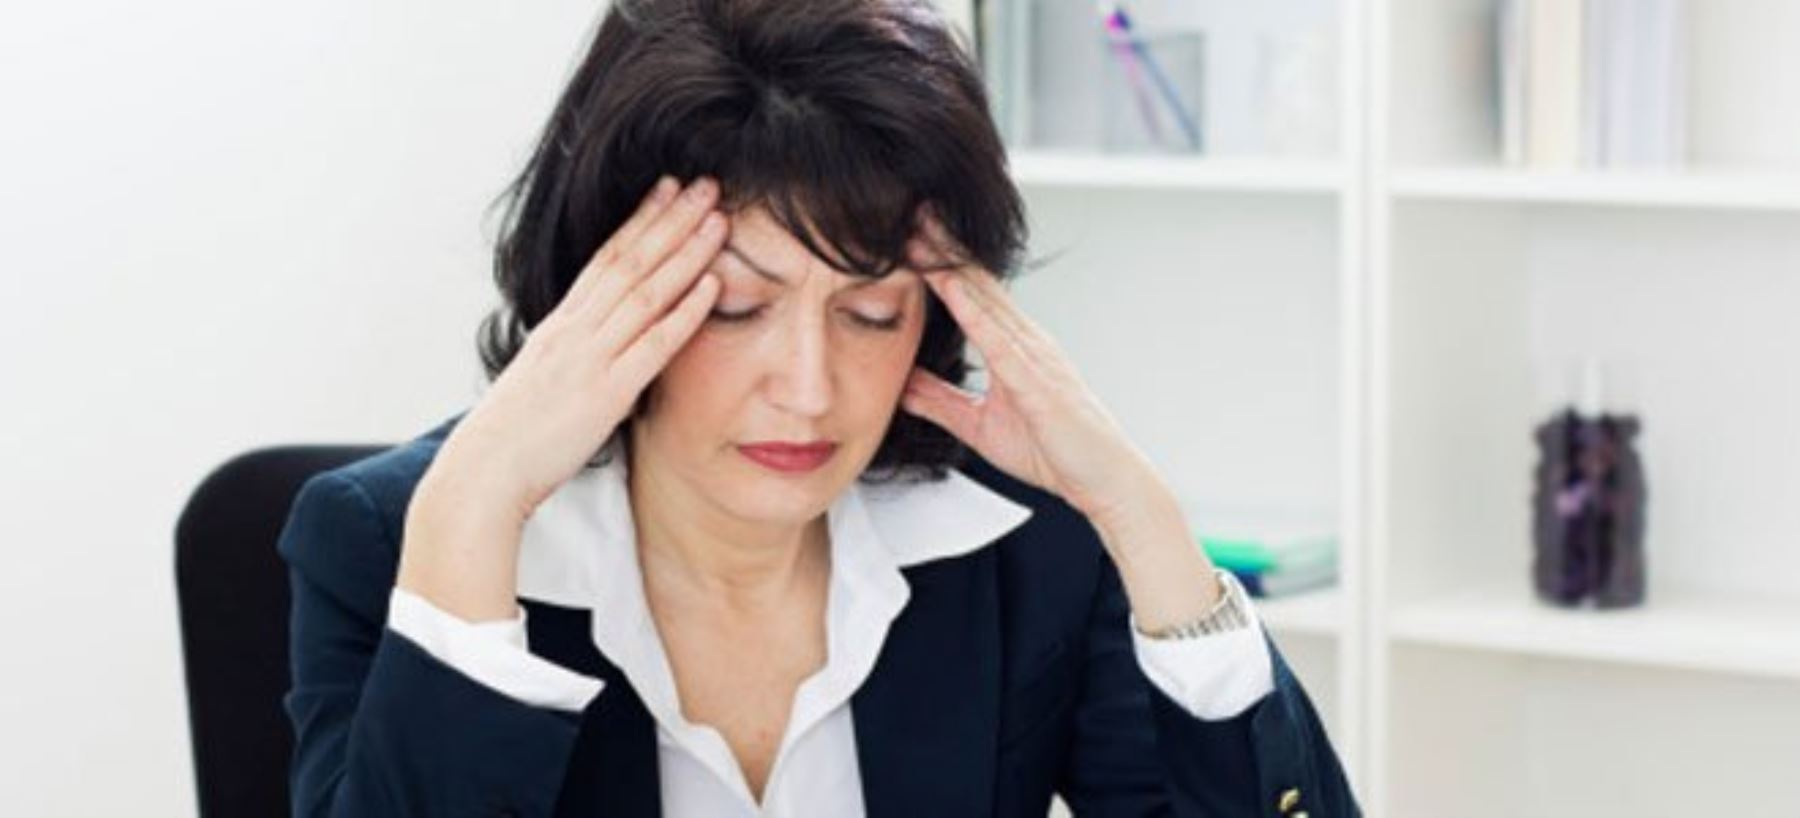 Mujeres con este problema deben buscar ayuda de ginecóloga. Foto: Difusión